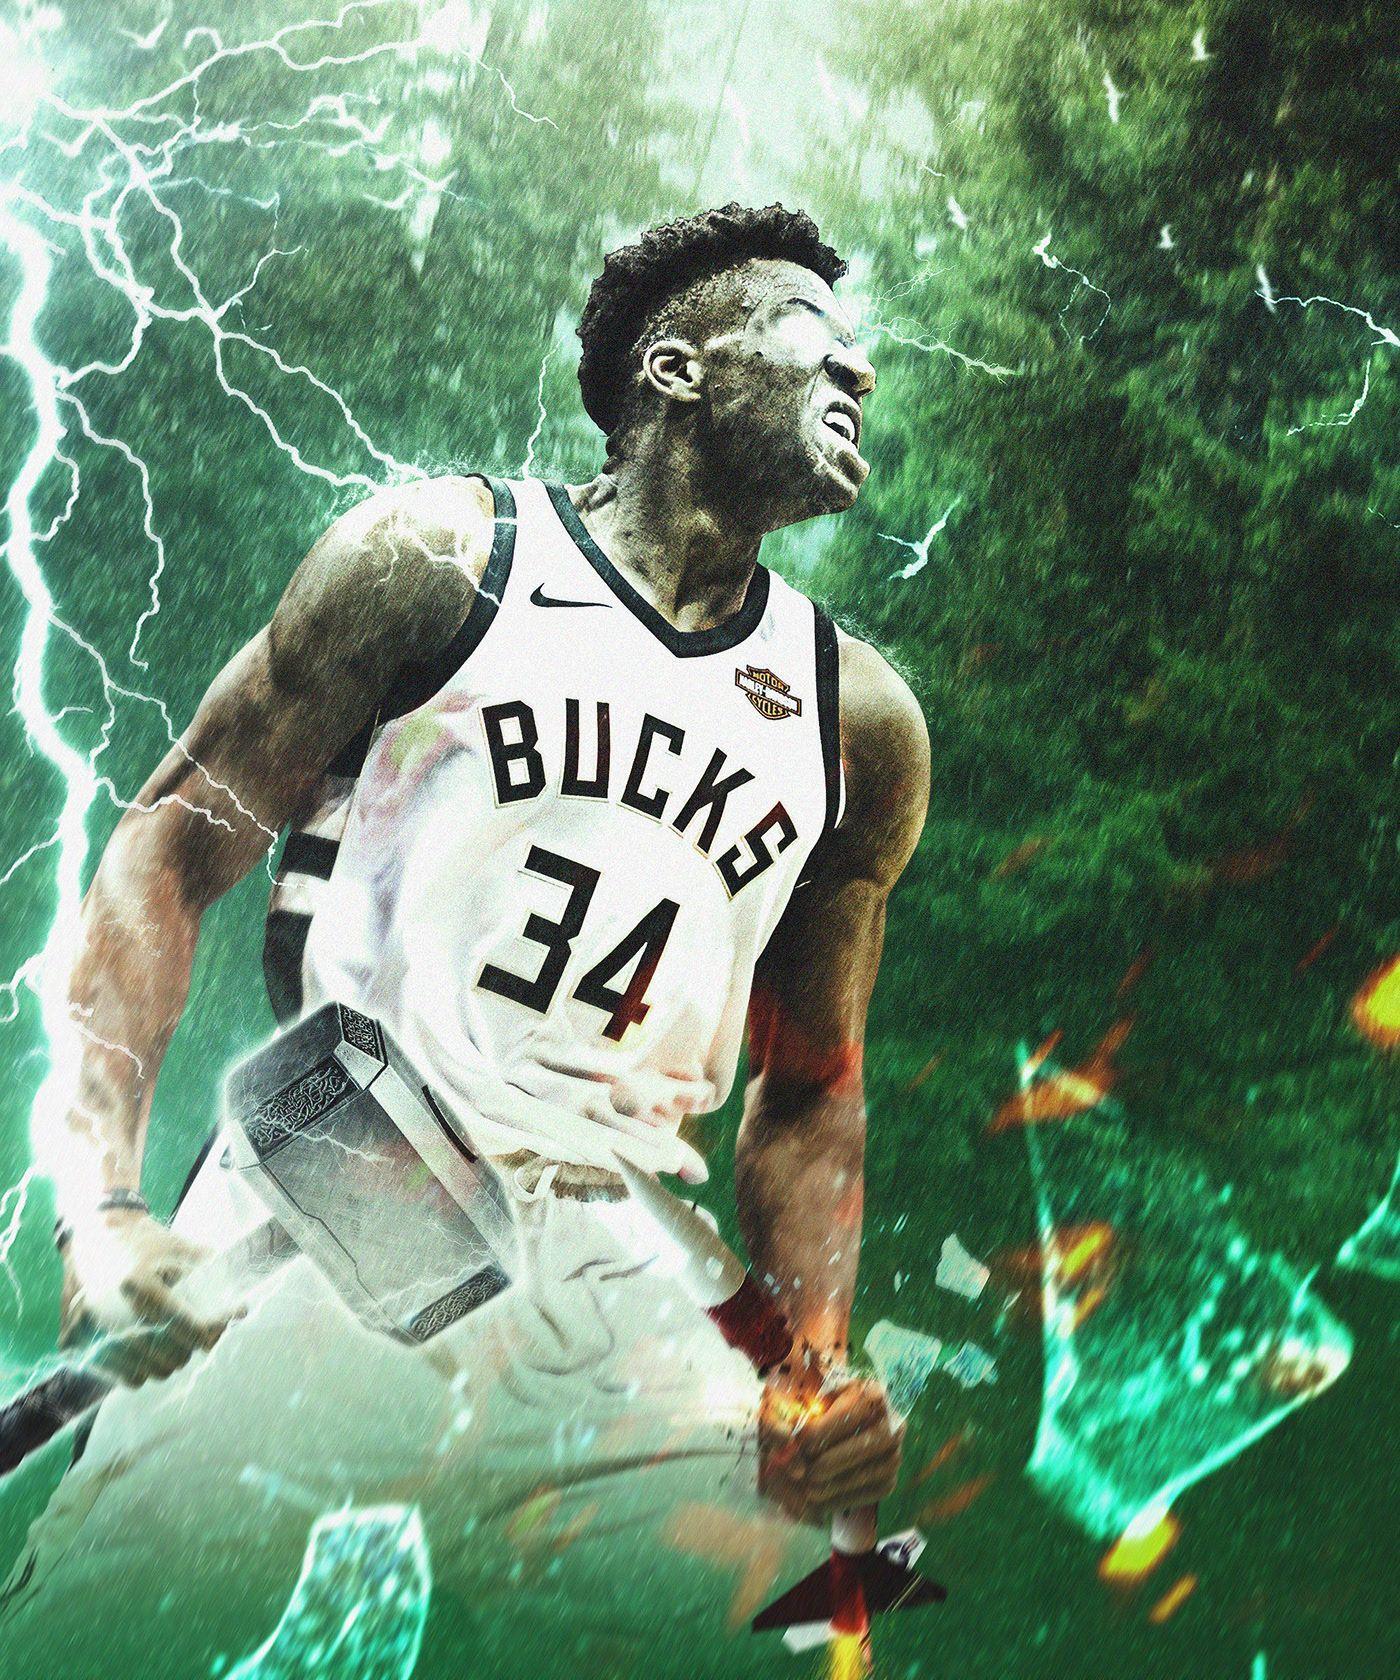 2019 Nba Kia Mvp Nba Basketball Art Nba Wallpapers Nba Mvp